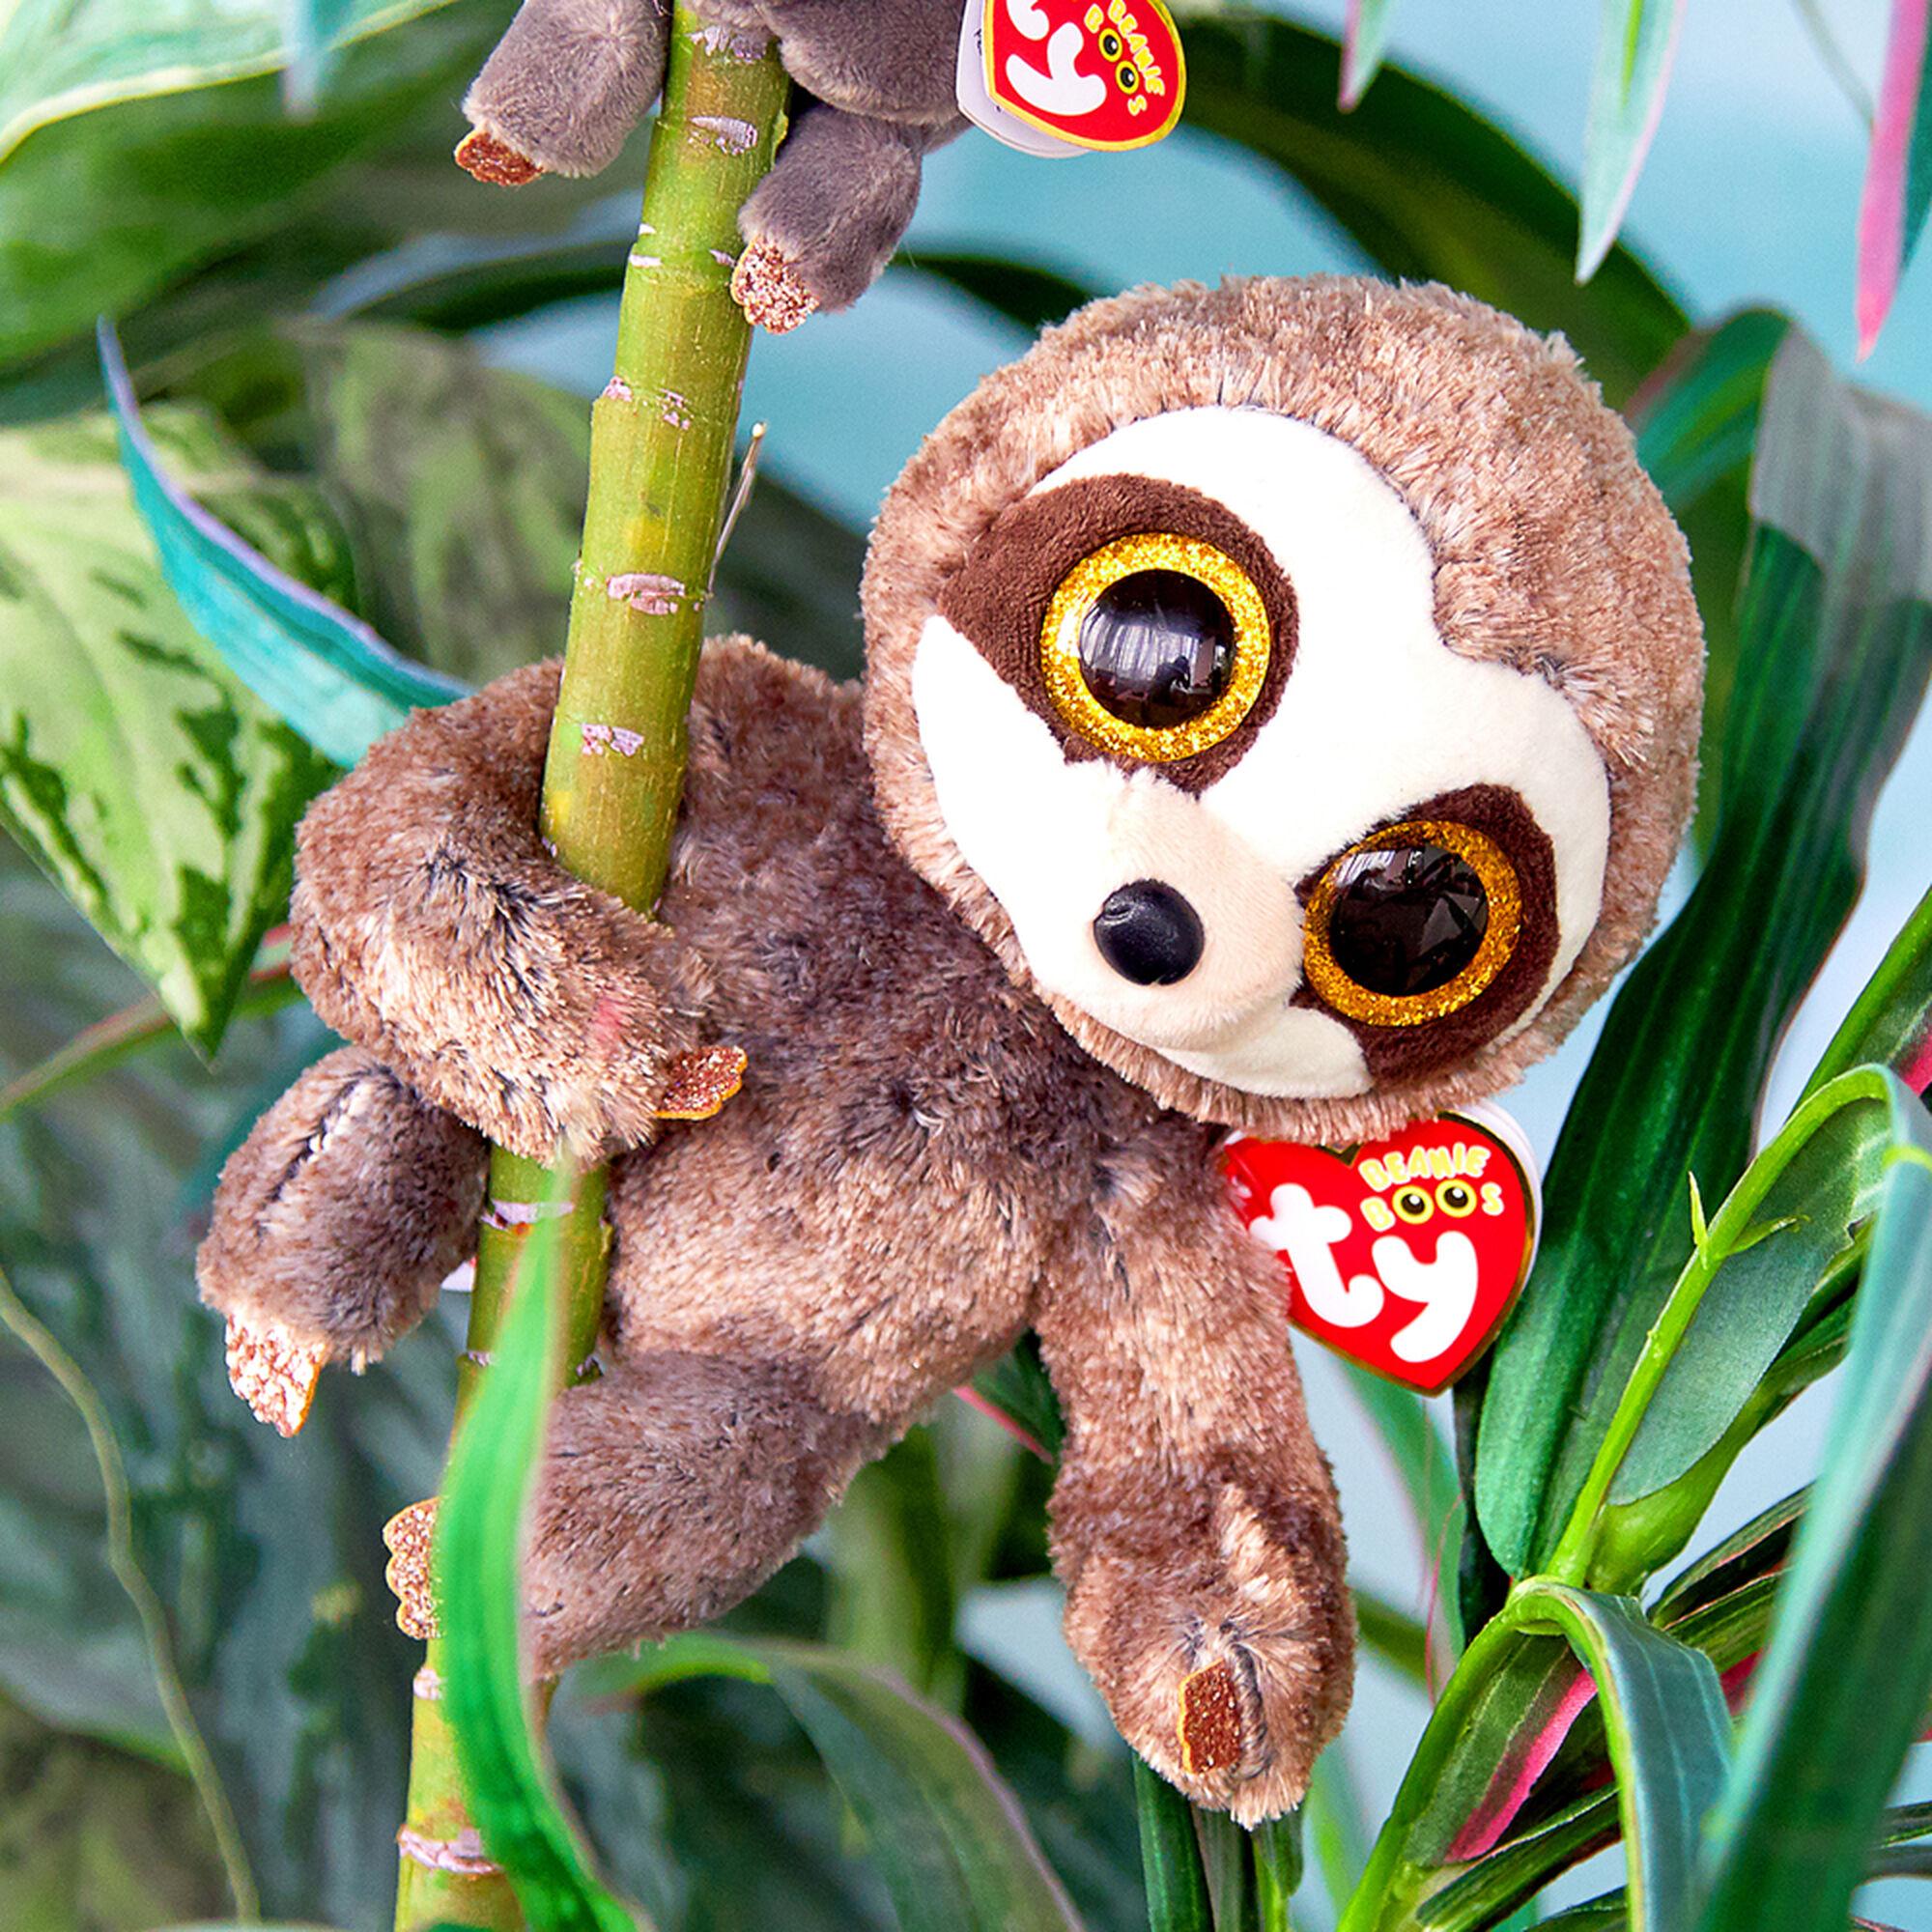 ... Ty Beanie Boo Medium Dangler the Sloth Plush Toy f0a293934e0d